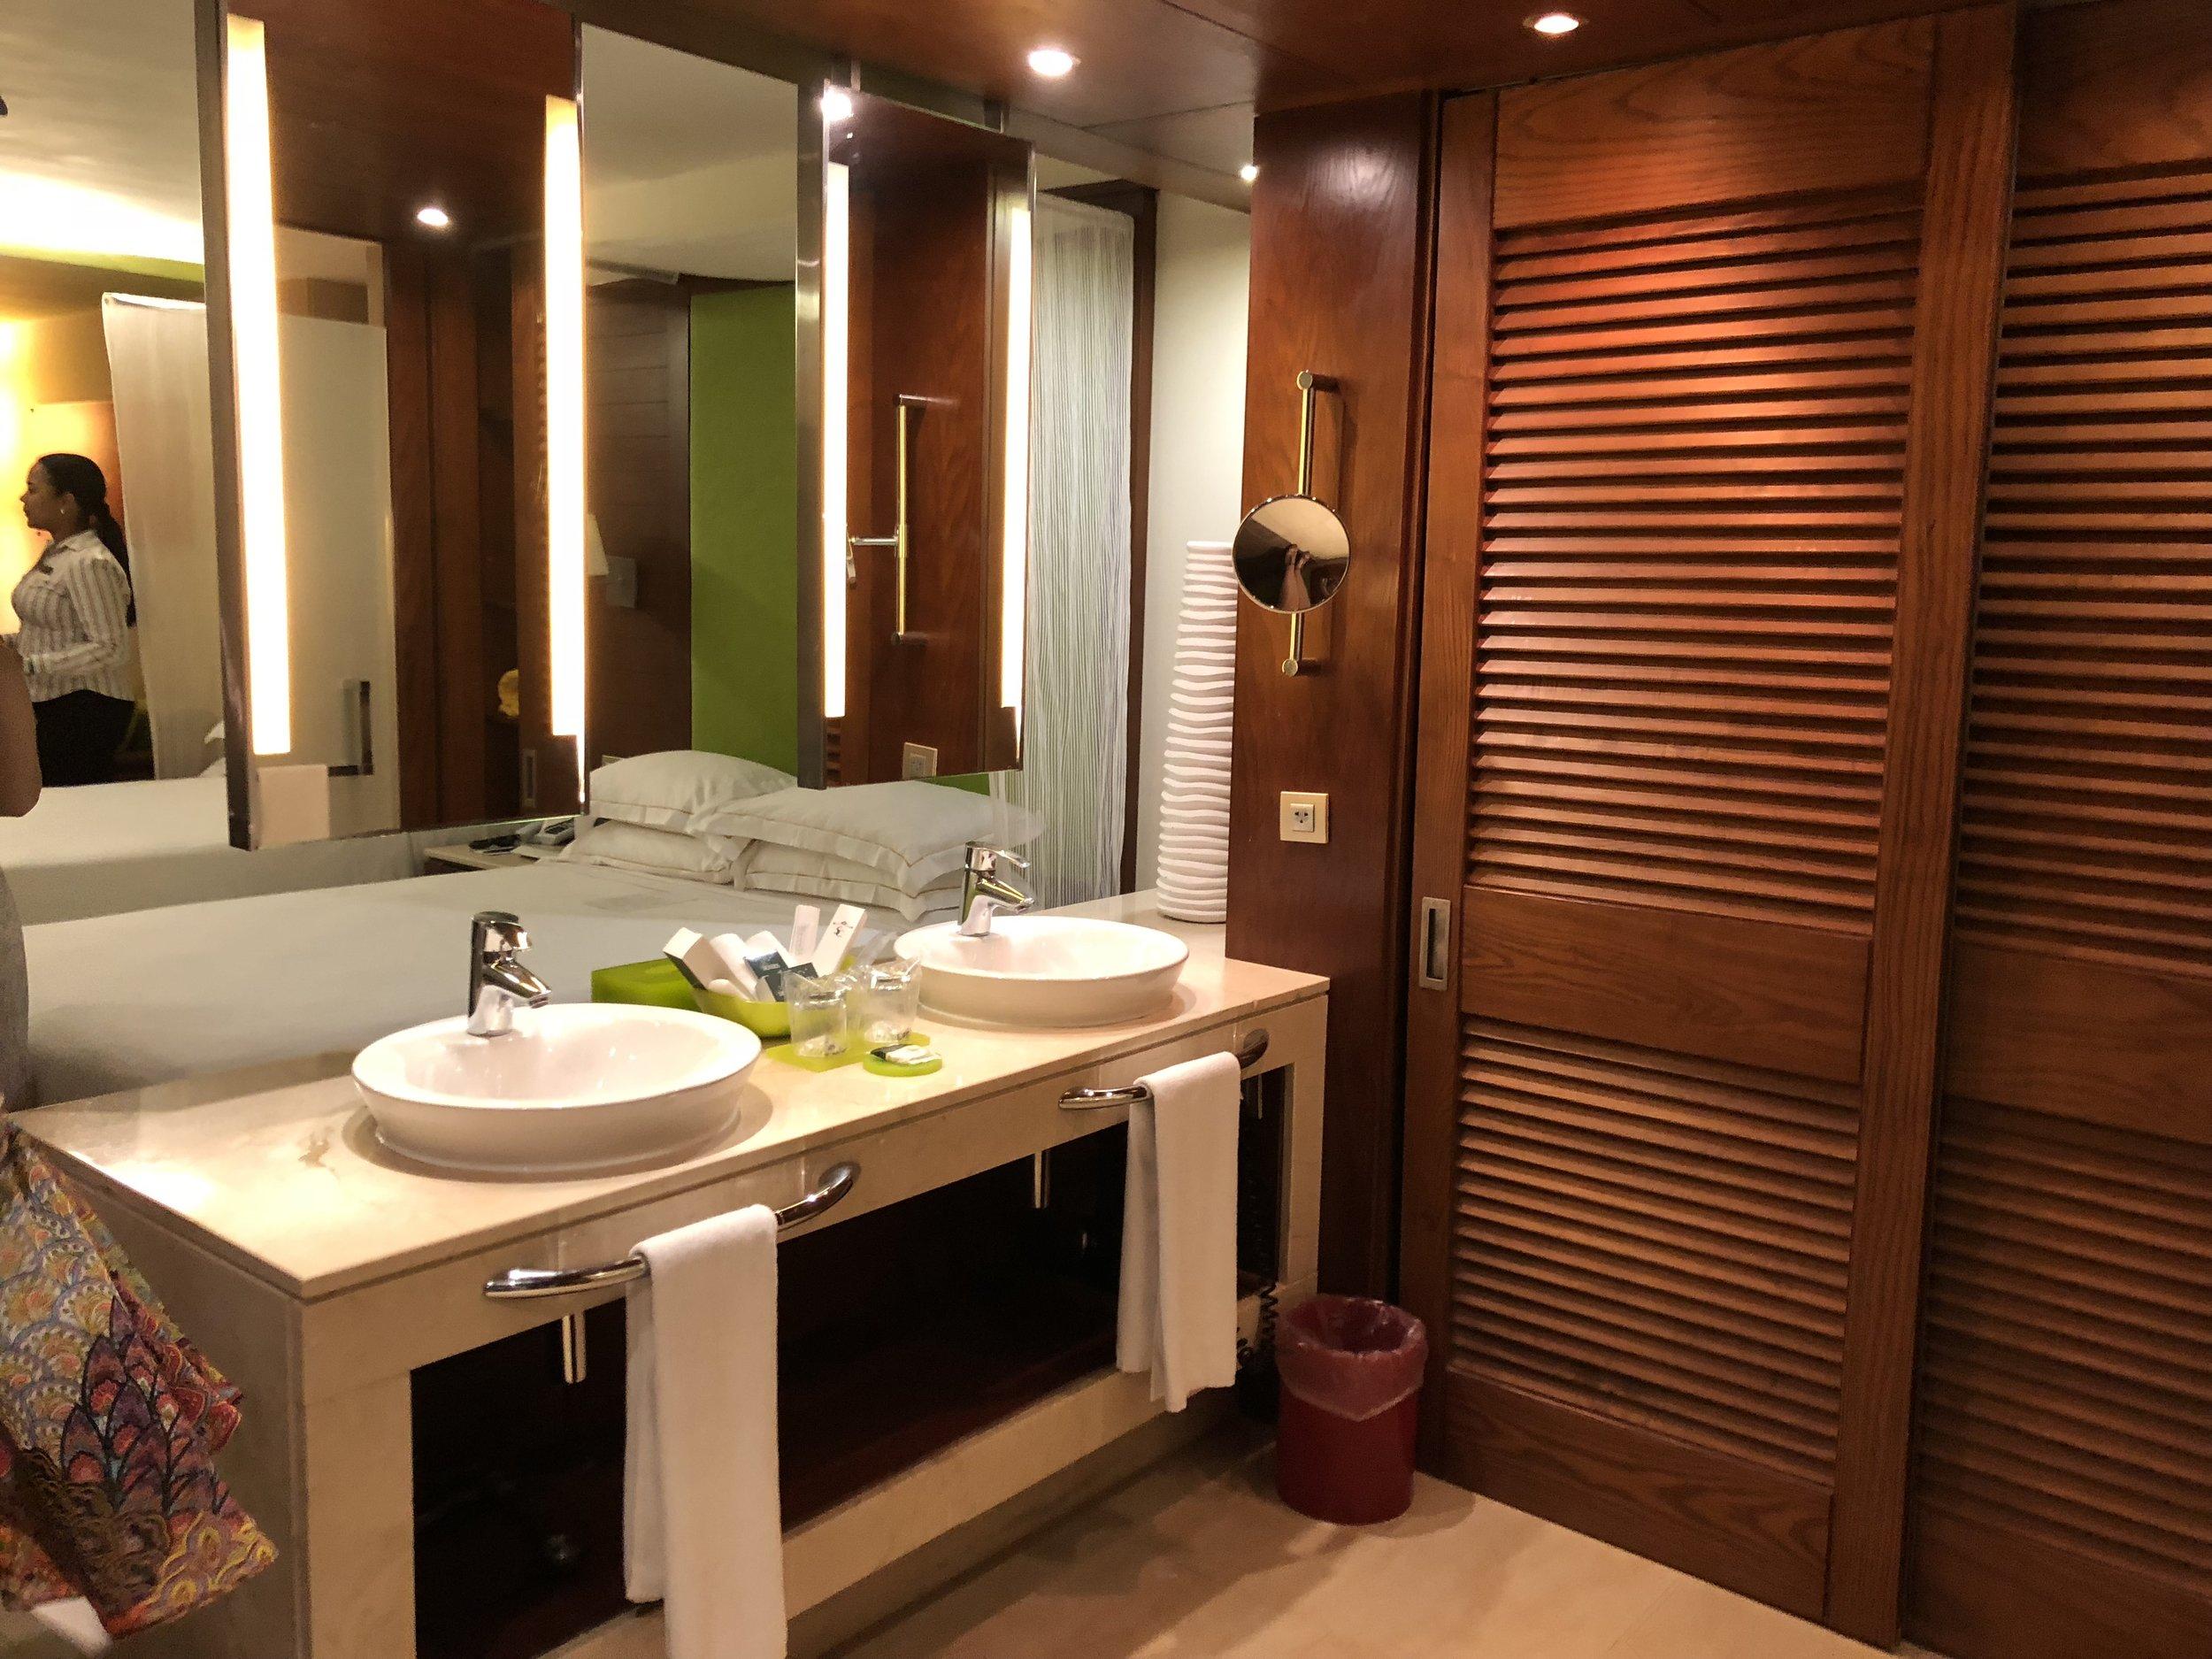 Spacious closet and striking bathroom.